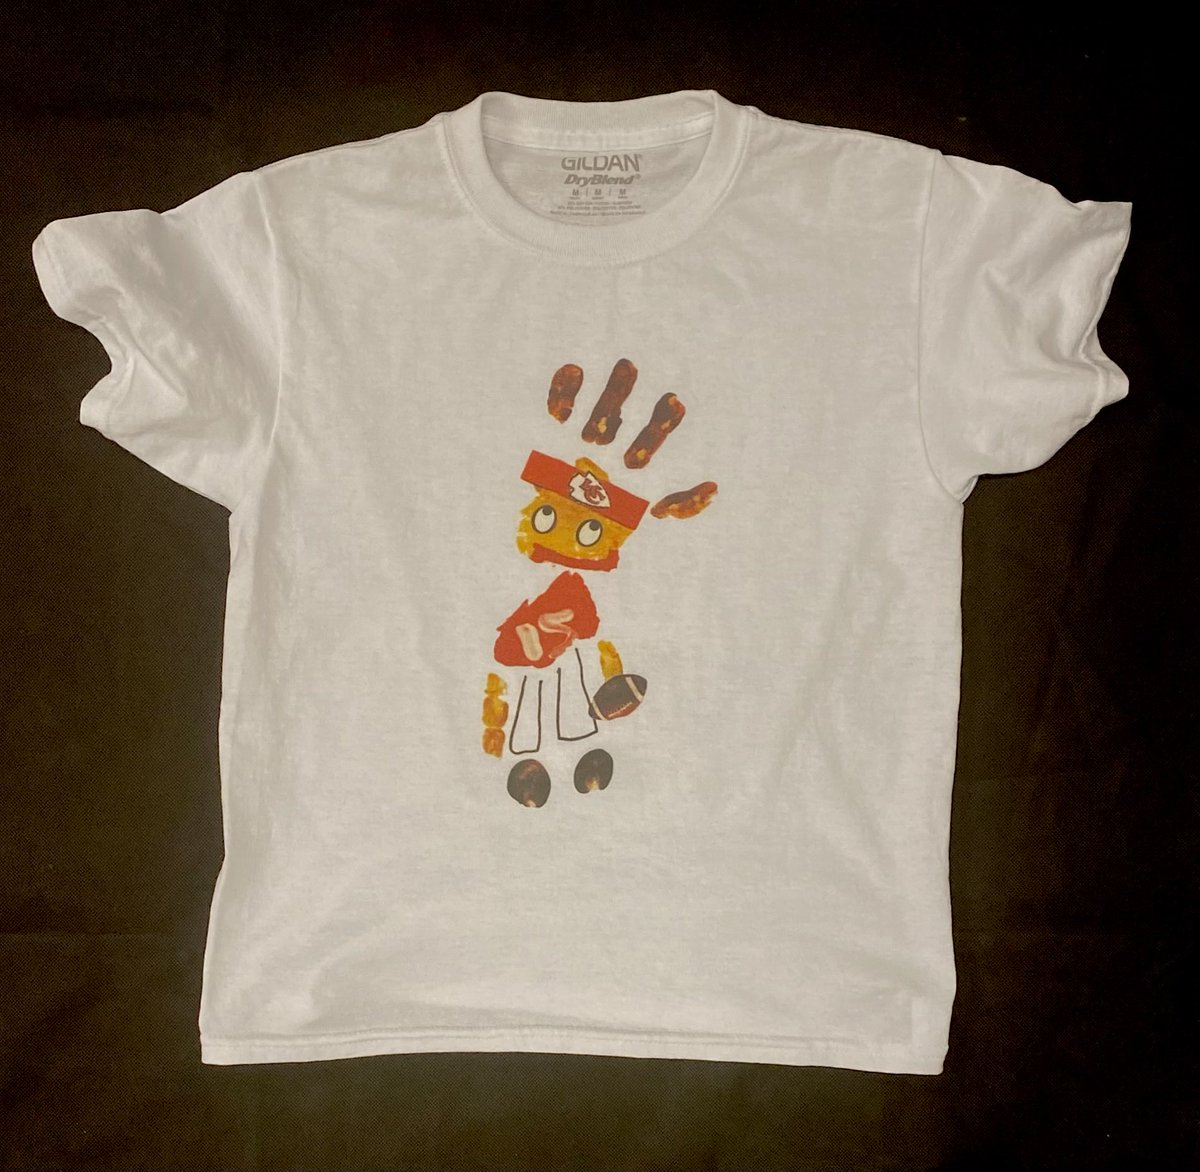 #youngartist #artandshirts #kc #kcchiefs #15 #mahomes